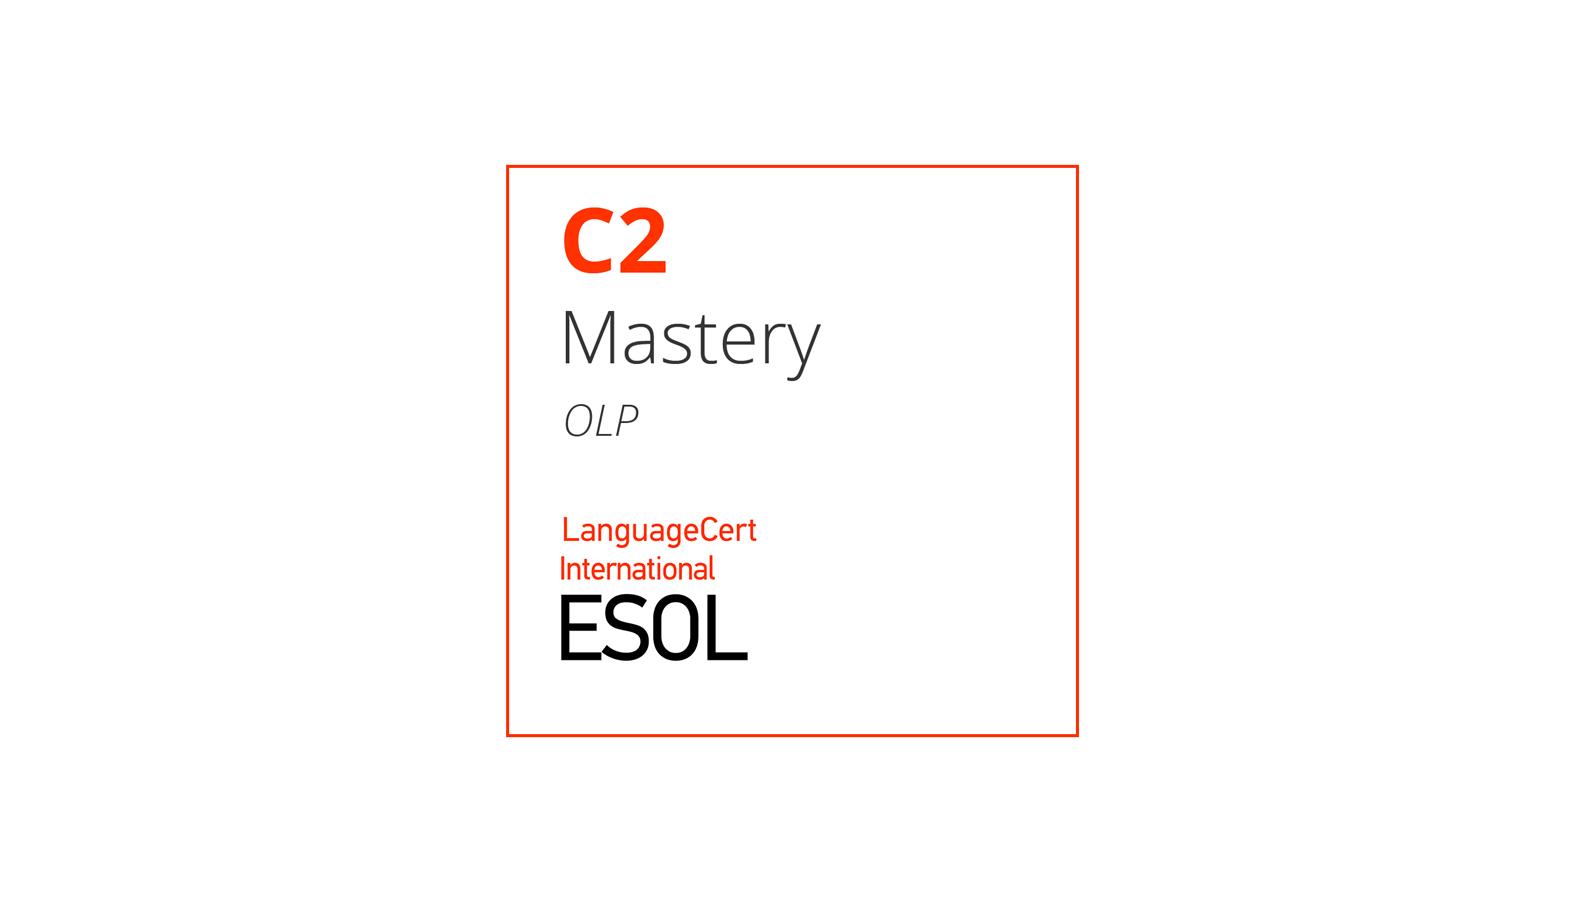 Esame di inglese online C2 LanguageCert International ESOL